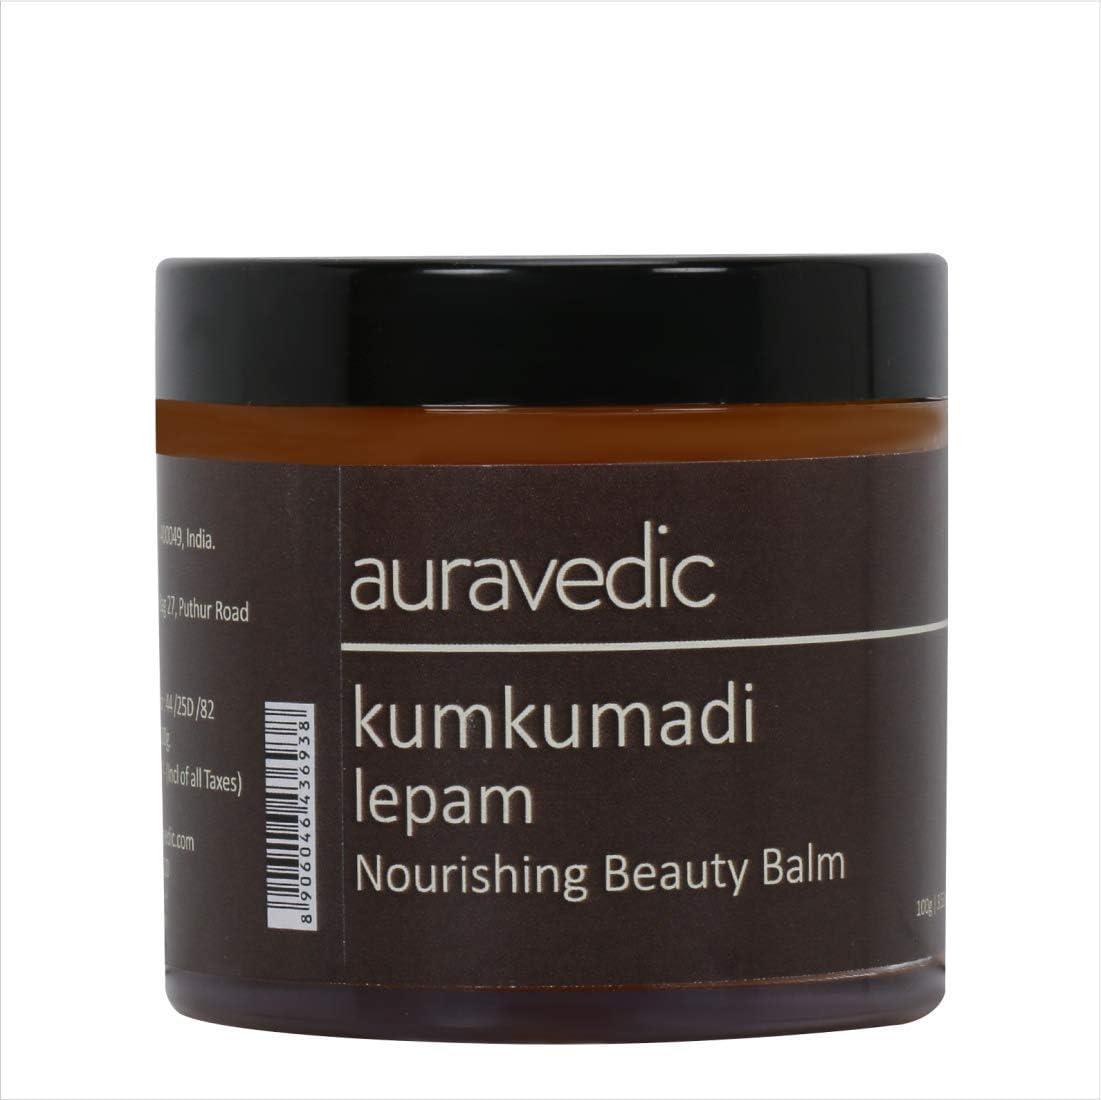 Finally resale start online shop Ifra Auravedic kumkumadi lepam Balm Brightening